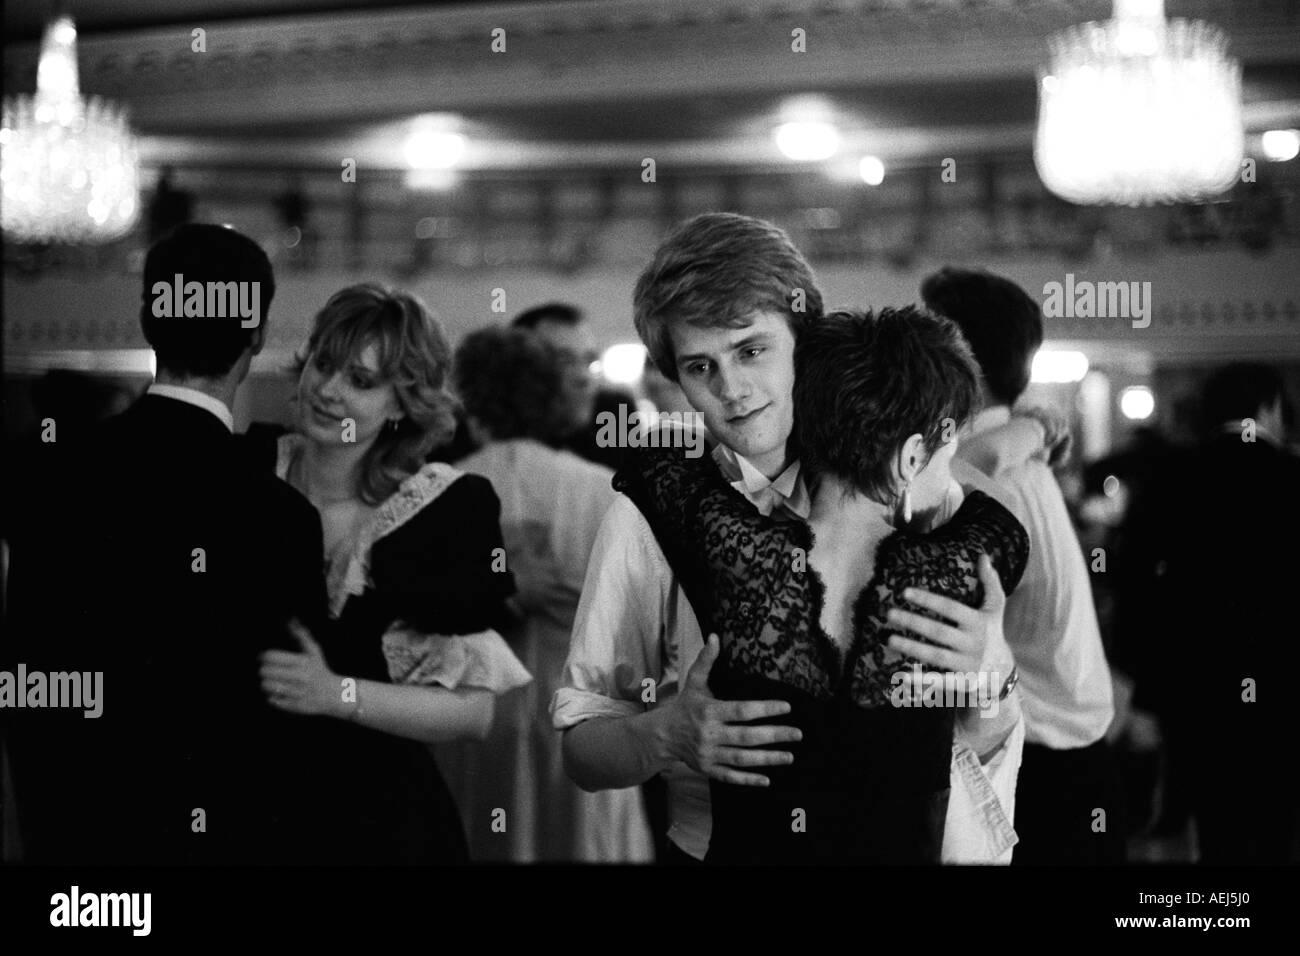 Baile de la rosa Grosvenor House Hotel, Park Lane, Londres, Inglaterra 1982. HOMER SYKES Imagen De Stock